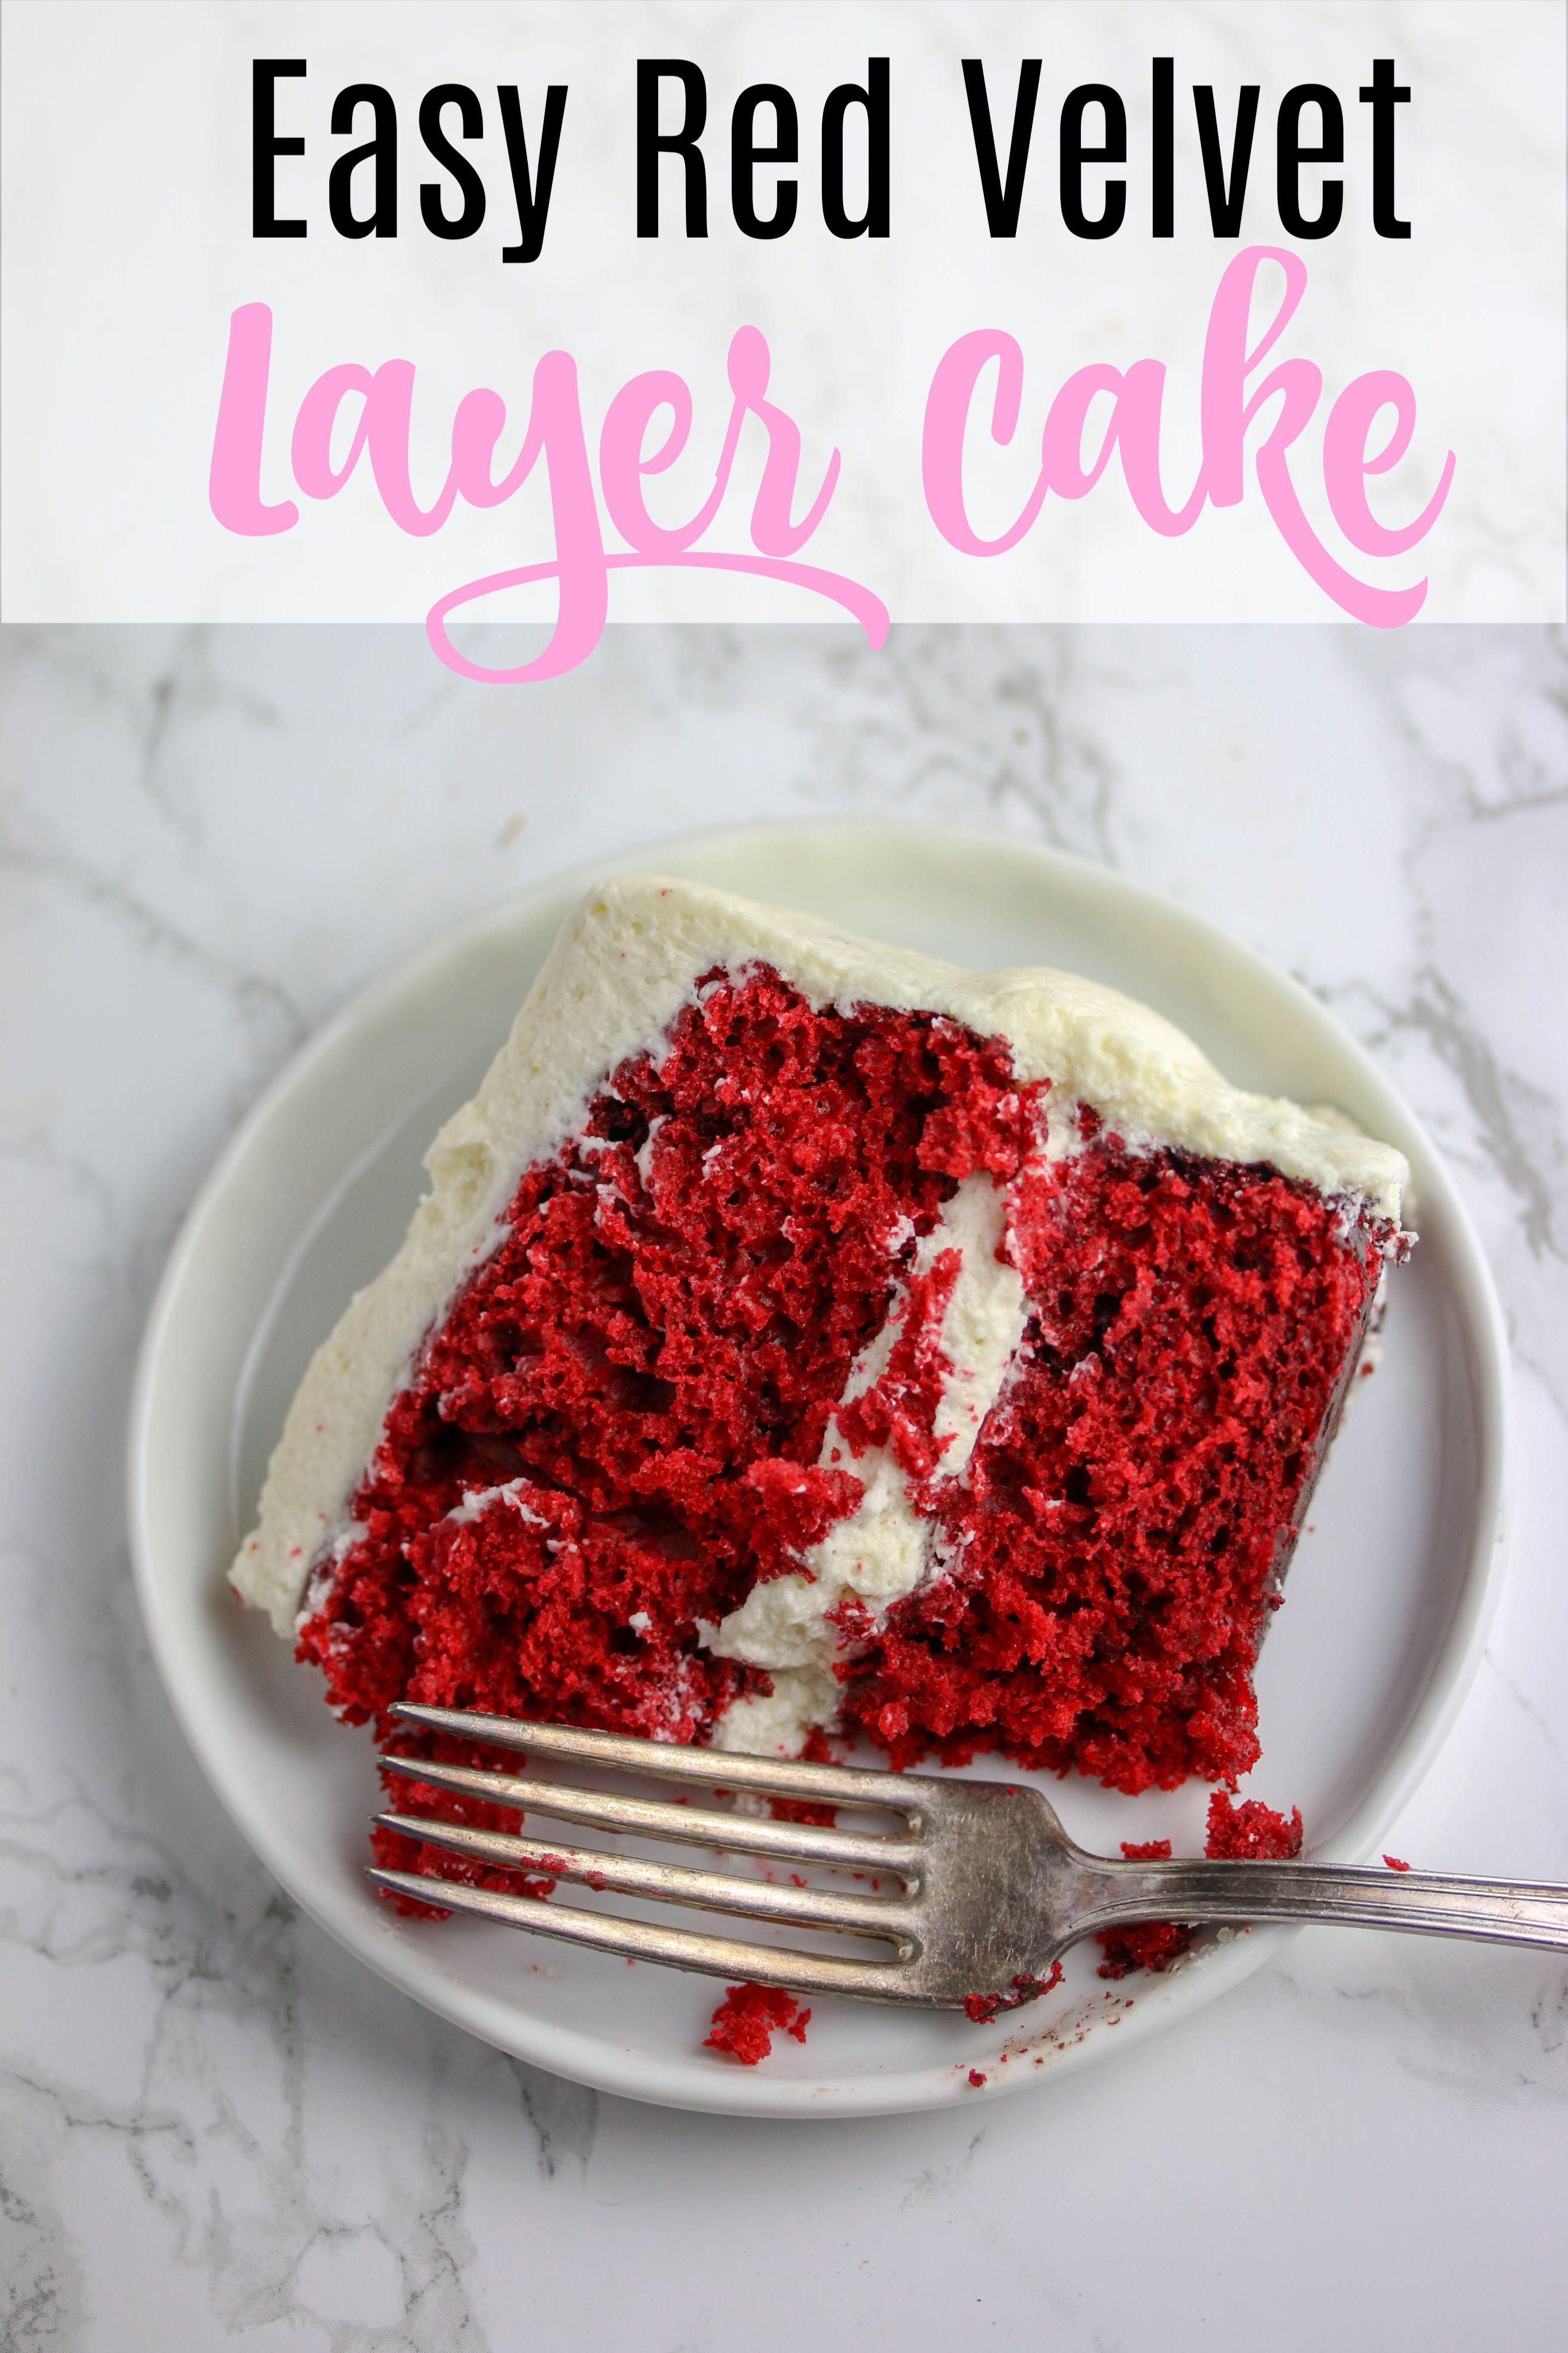 Easy Red Velvet Layer Cake Recipe Recipe Velvet Cake Recipes Red Velvet Cake Easy Red Velvet Cake